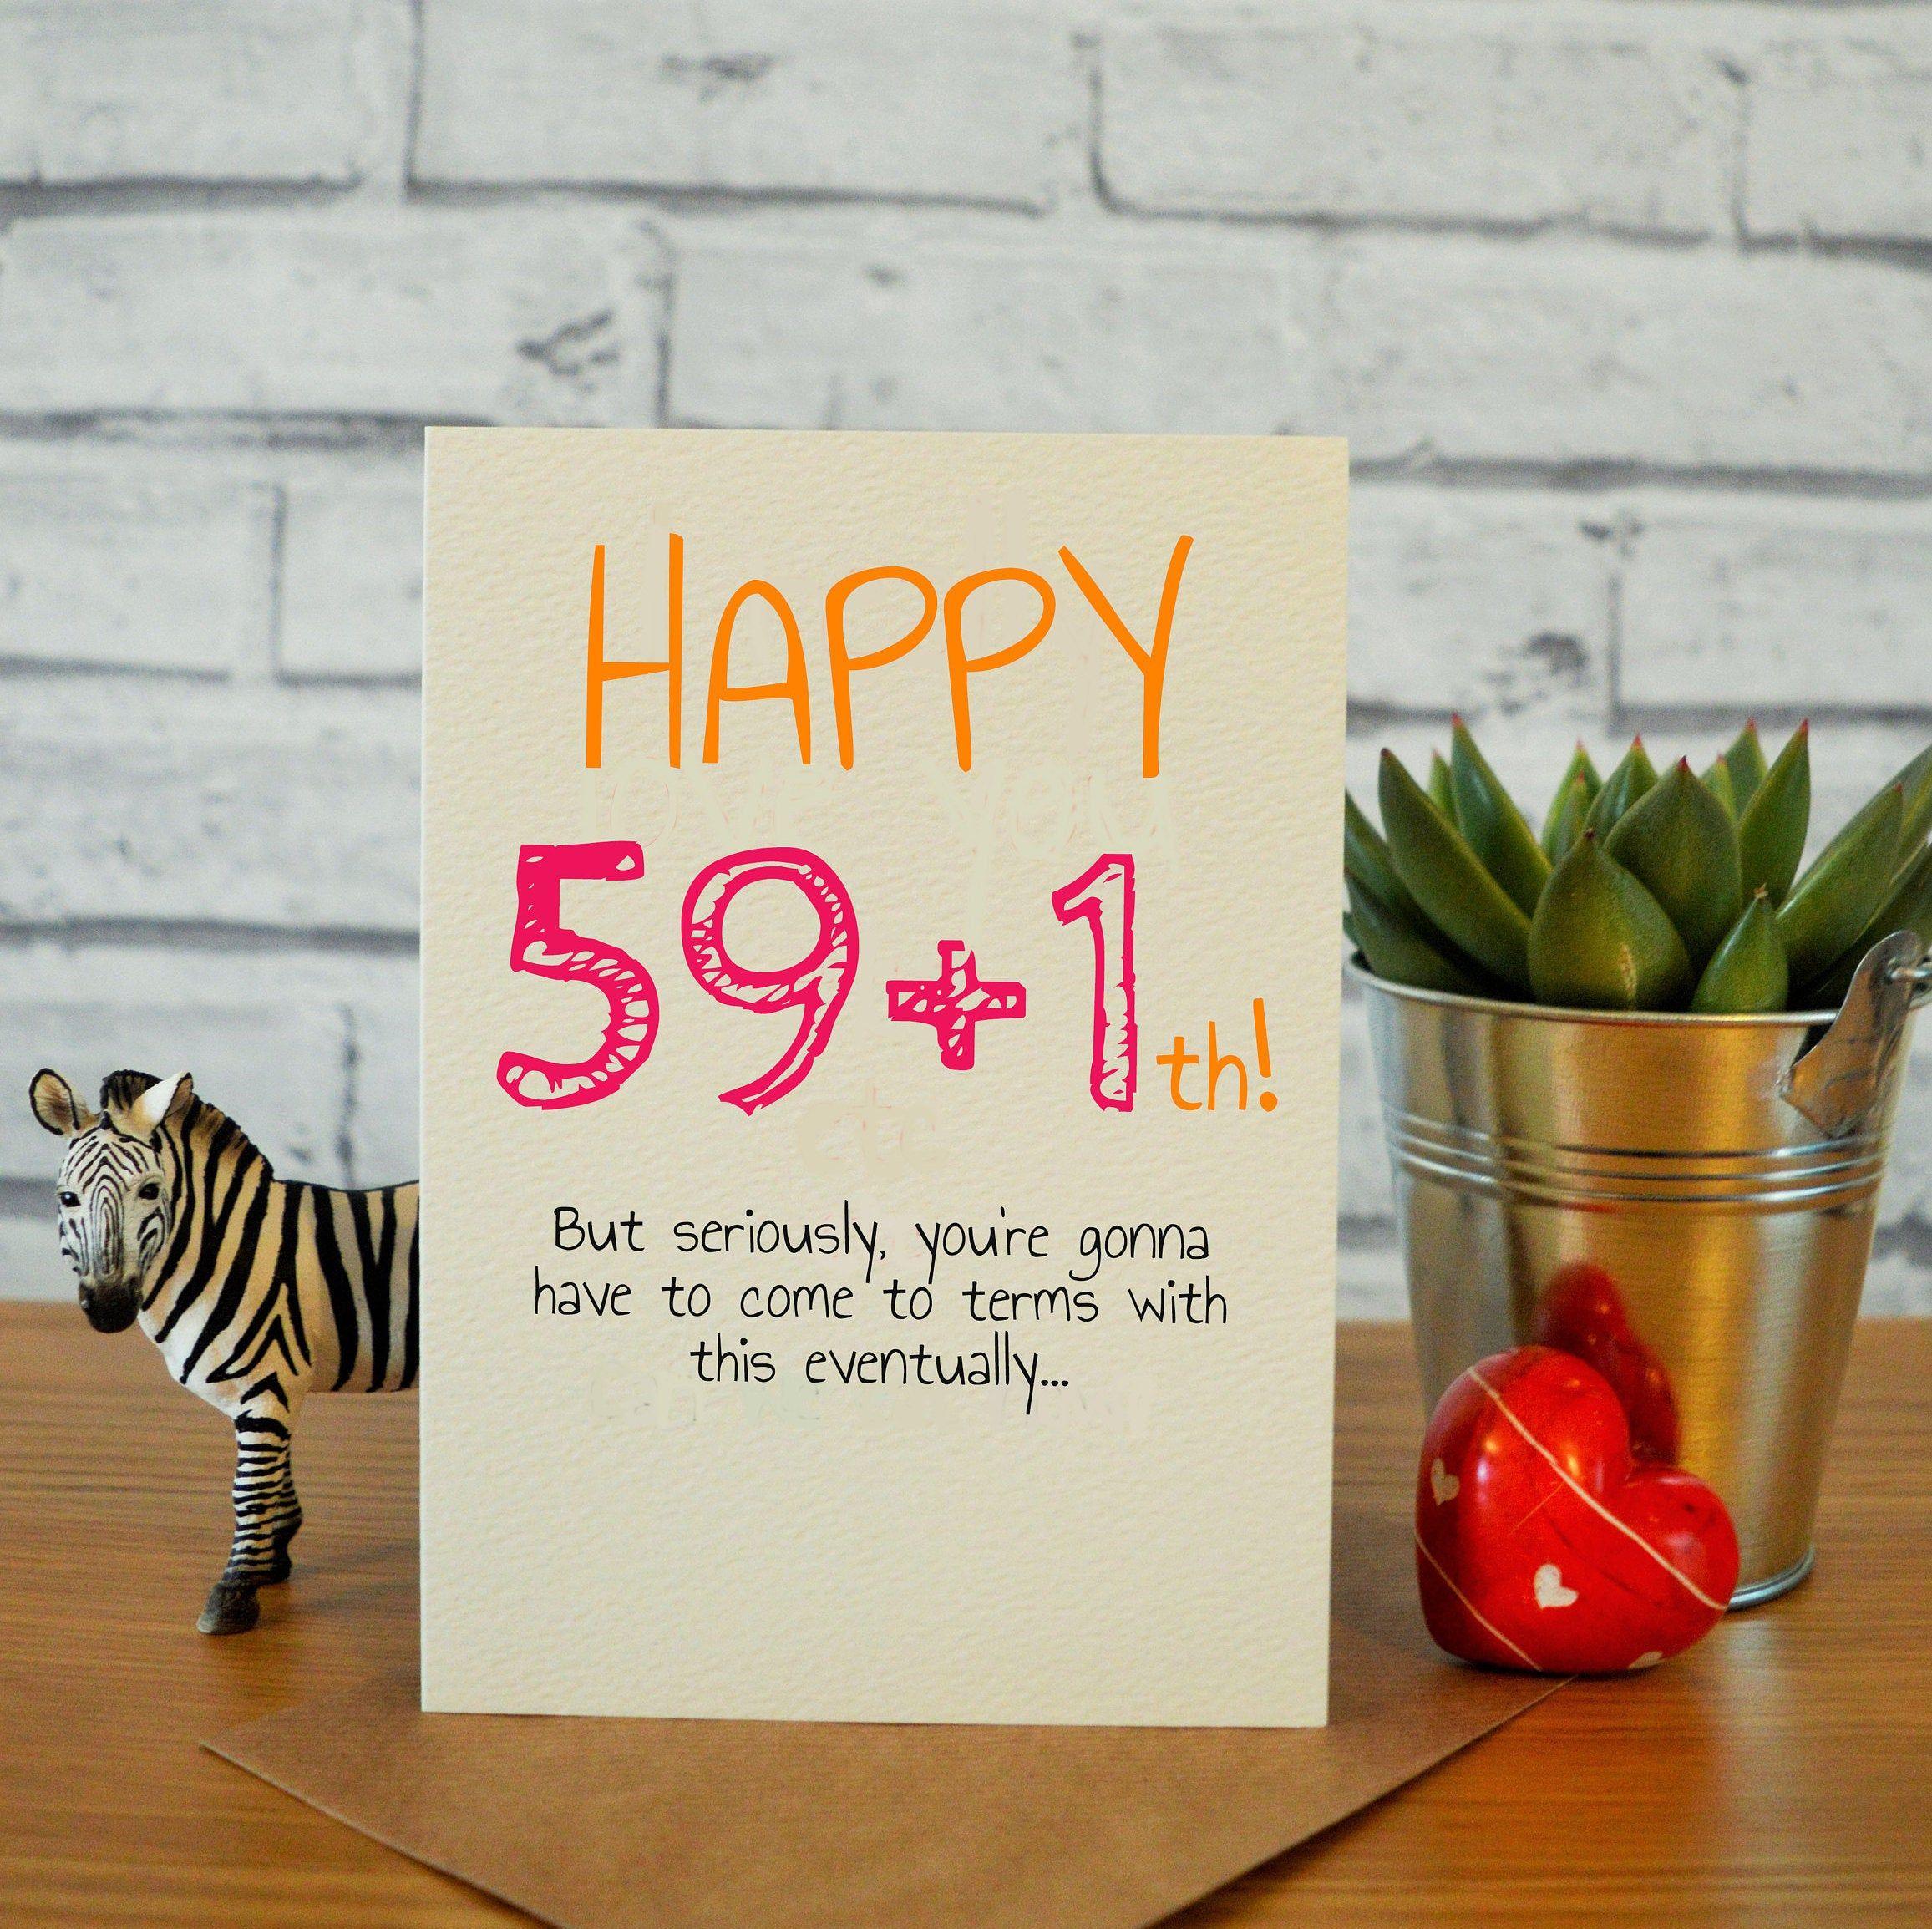 60th Birthday Funny Birthday Cards Mum 60th Dad 60th Funny Birthday Card Happy 60th Birthday 60th Birthday Gift 60 Birthday Gifts Biglietti Auguri Fai Da Te Compleanno Biglietti Auguri Fai Da